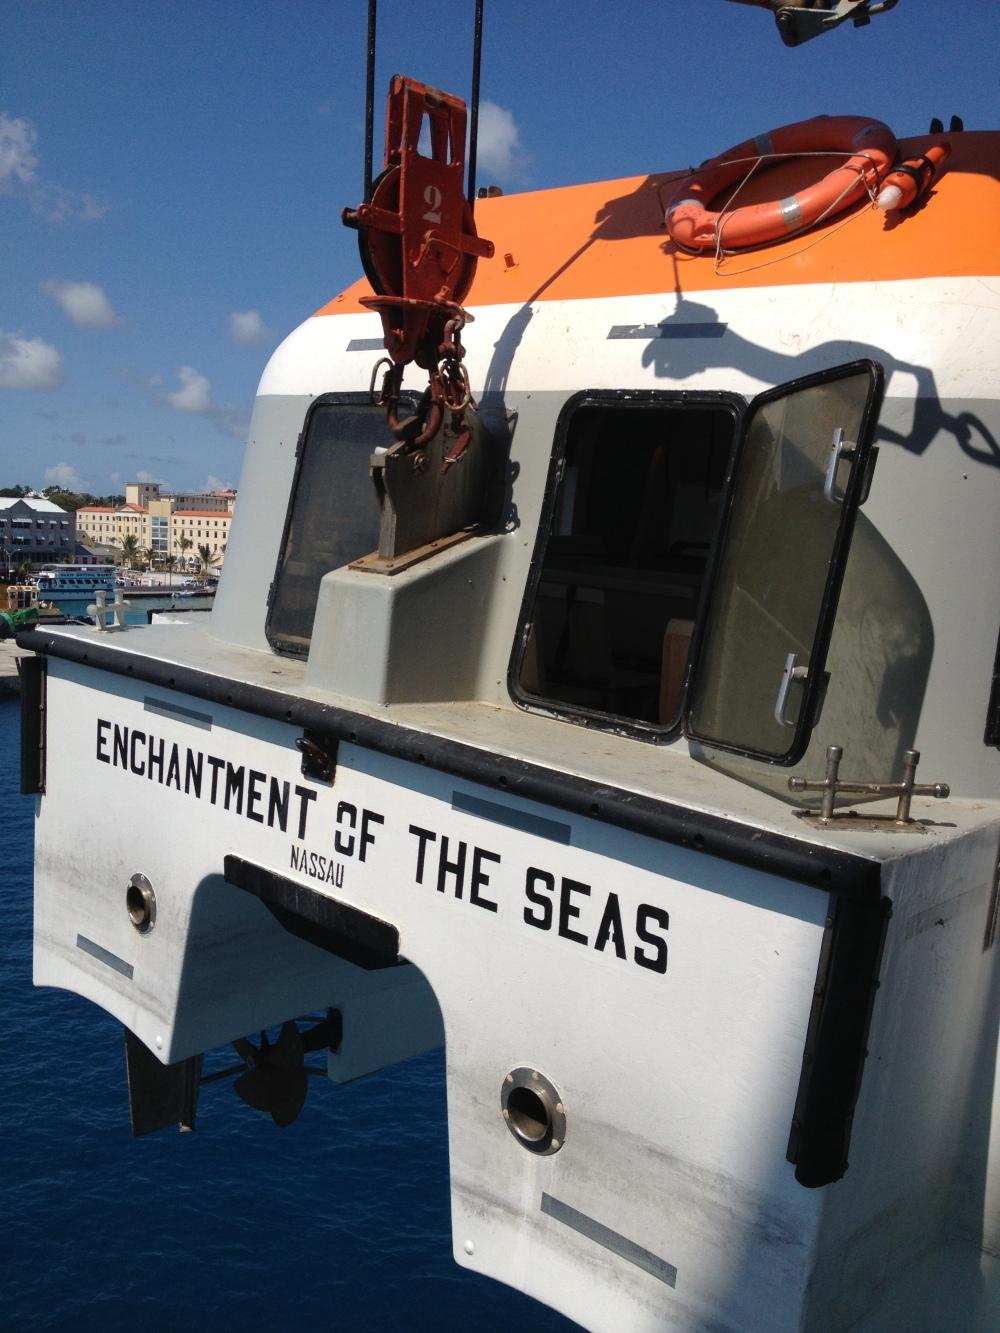 Enchantment Lifeboat